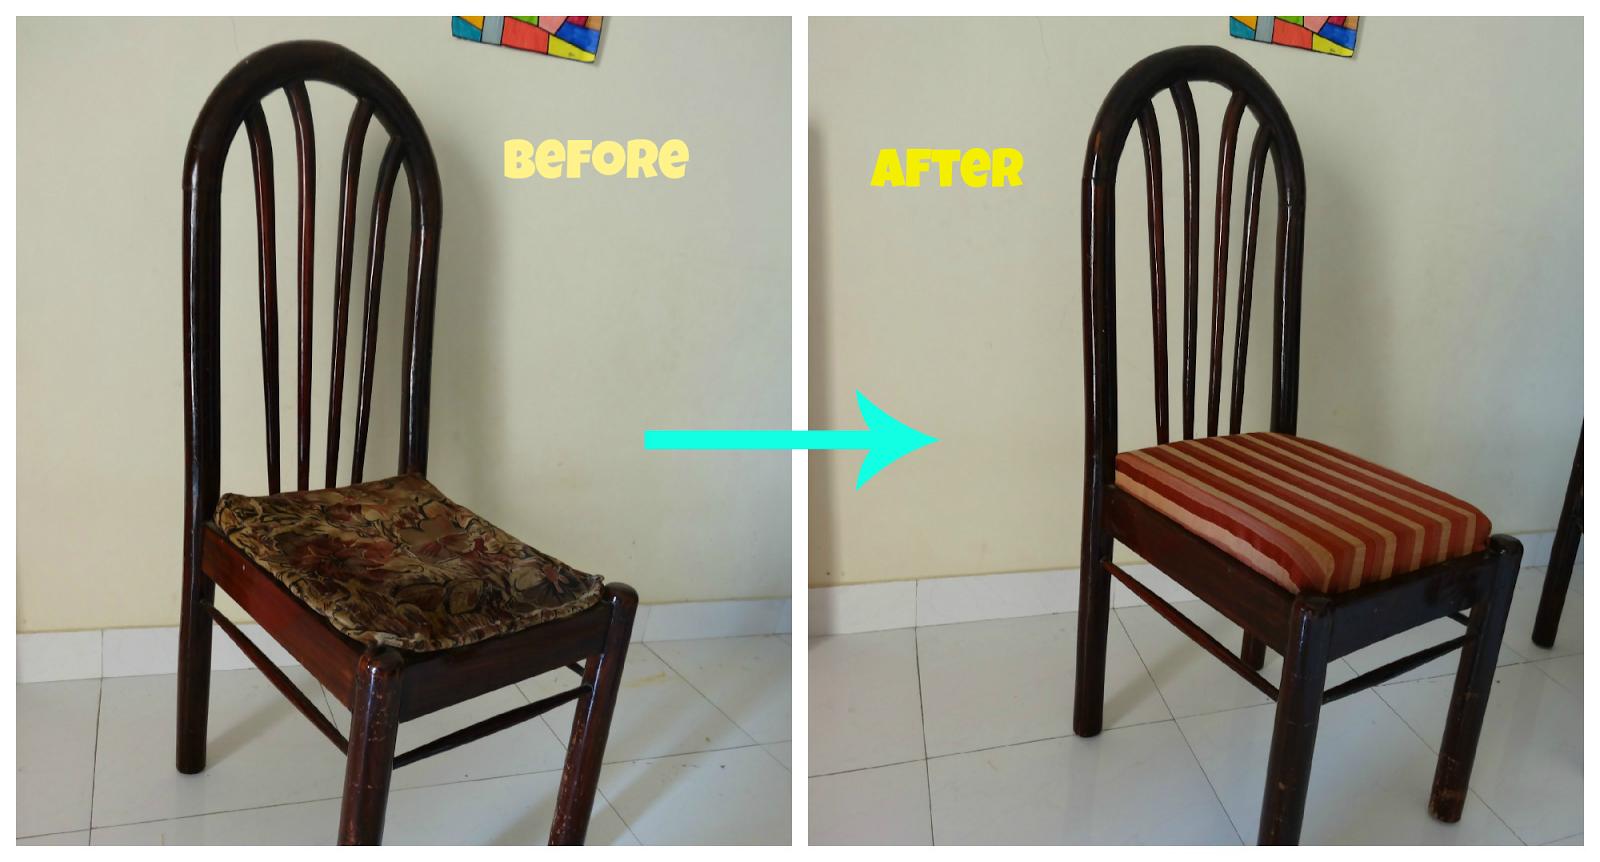 NichuSpace: Upholster a chair